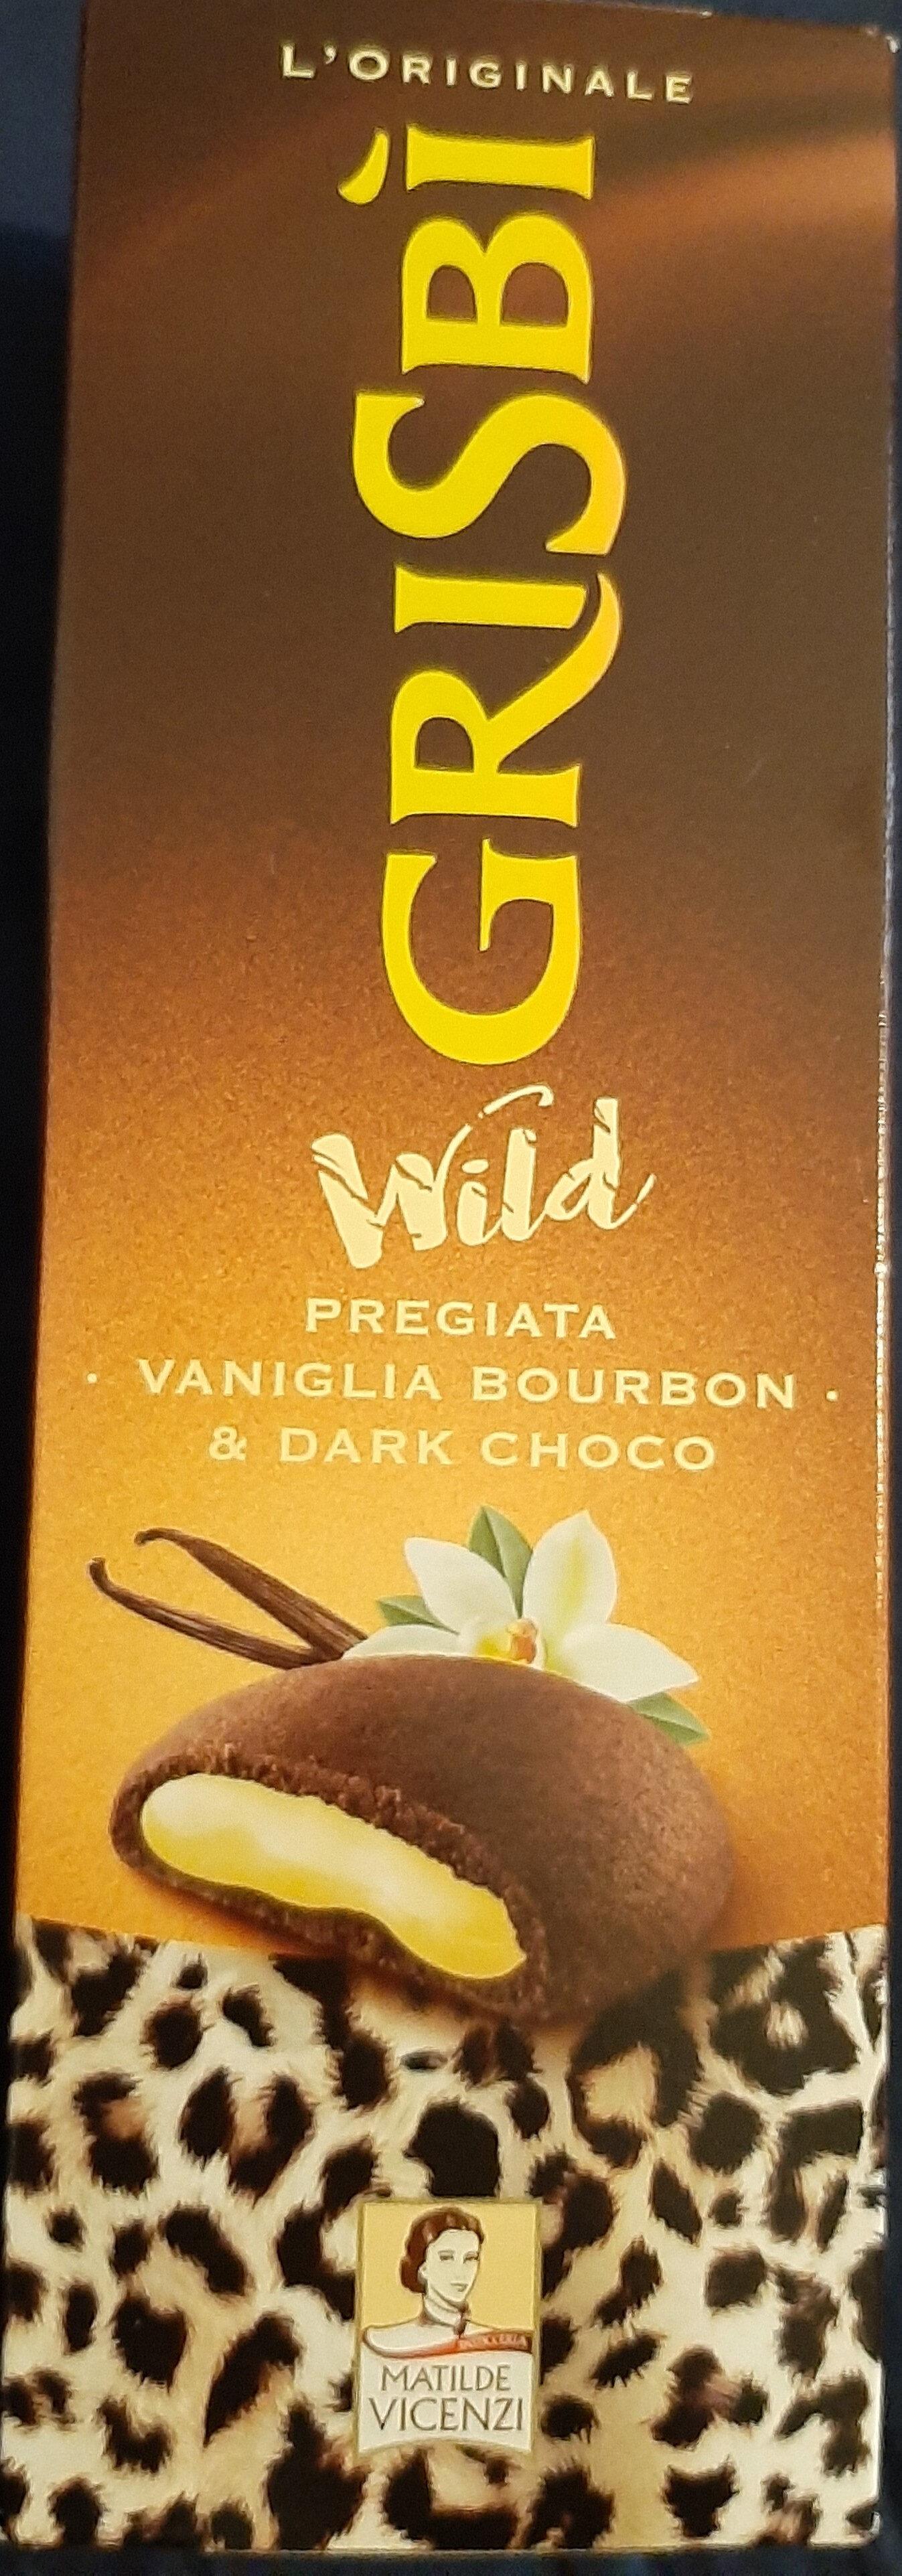 Grisbi Wild pregiata vaniglia Bourbon & dark choco - Product - it